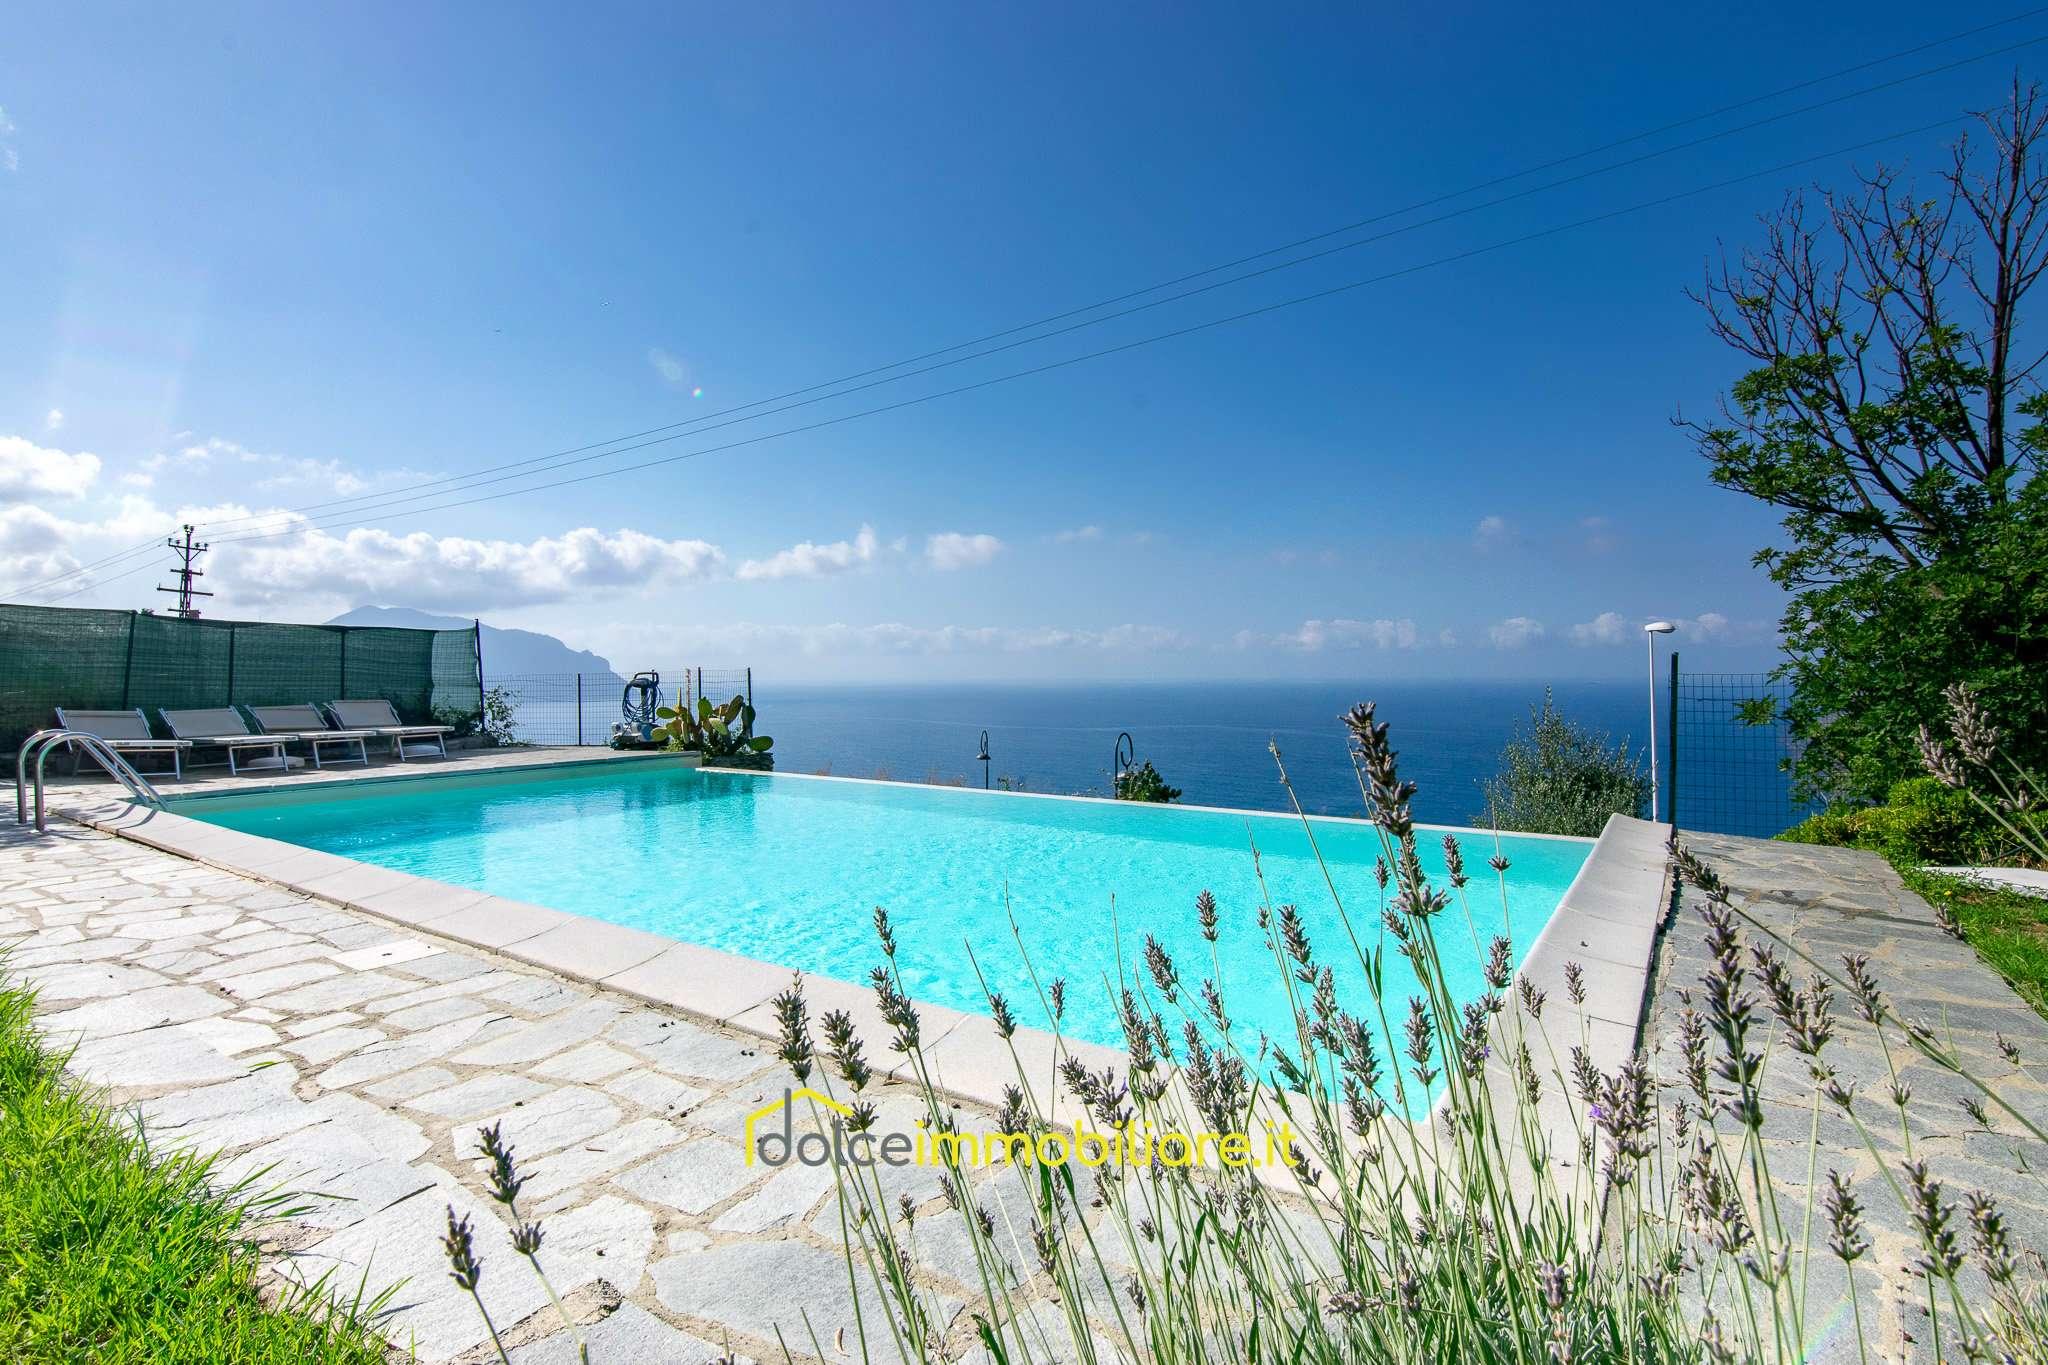 Appartamento in vendita a Pieve Ligure, 4 locali, Trattative riservate   PortaleAgenzieImmobiliari.it